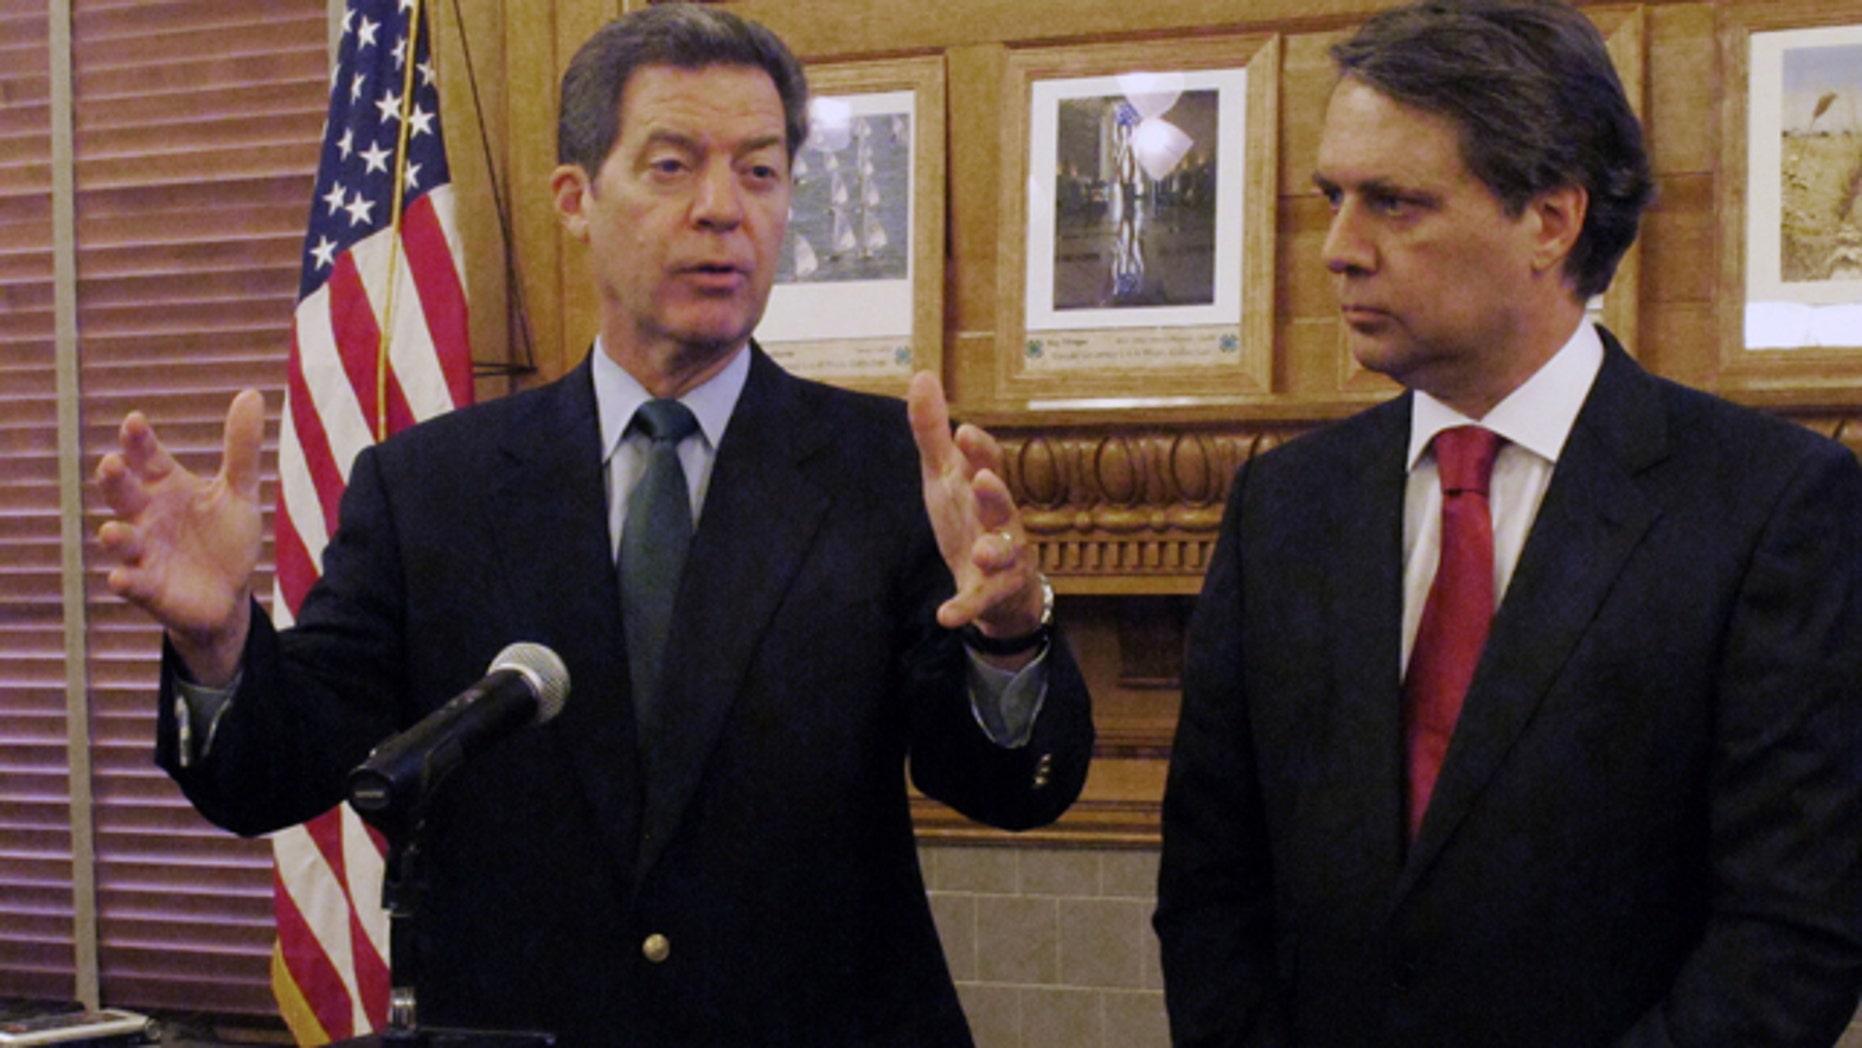 FILE - In this Sept. 11, 2014 file photograph, Kansas Gov. Sam Brownback, left, and Lt. Gov. Jeff Colyer speak at the Statehouse in Topeka. (AP Photo/John Hanna, File)